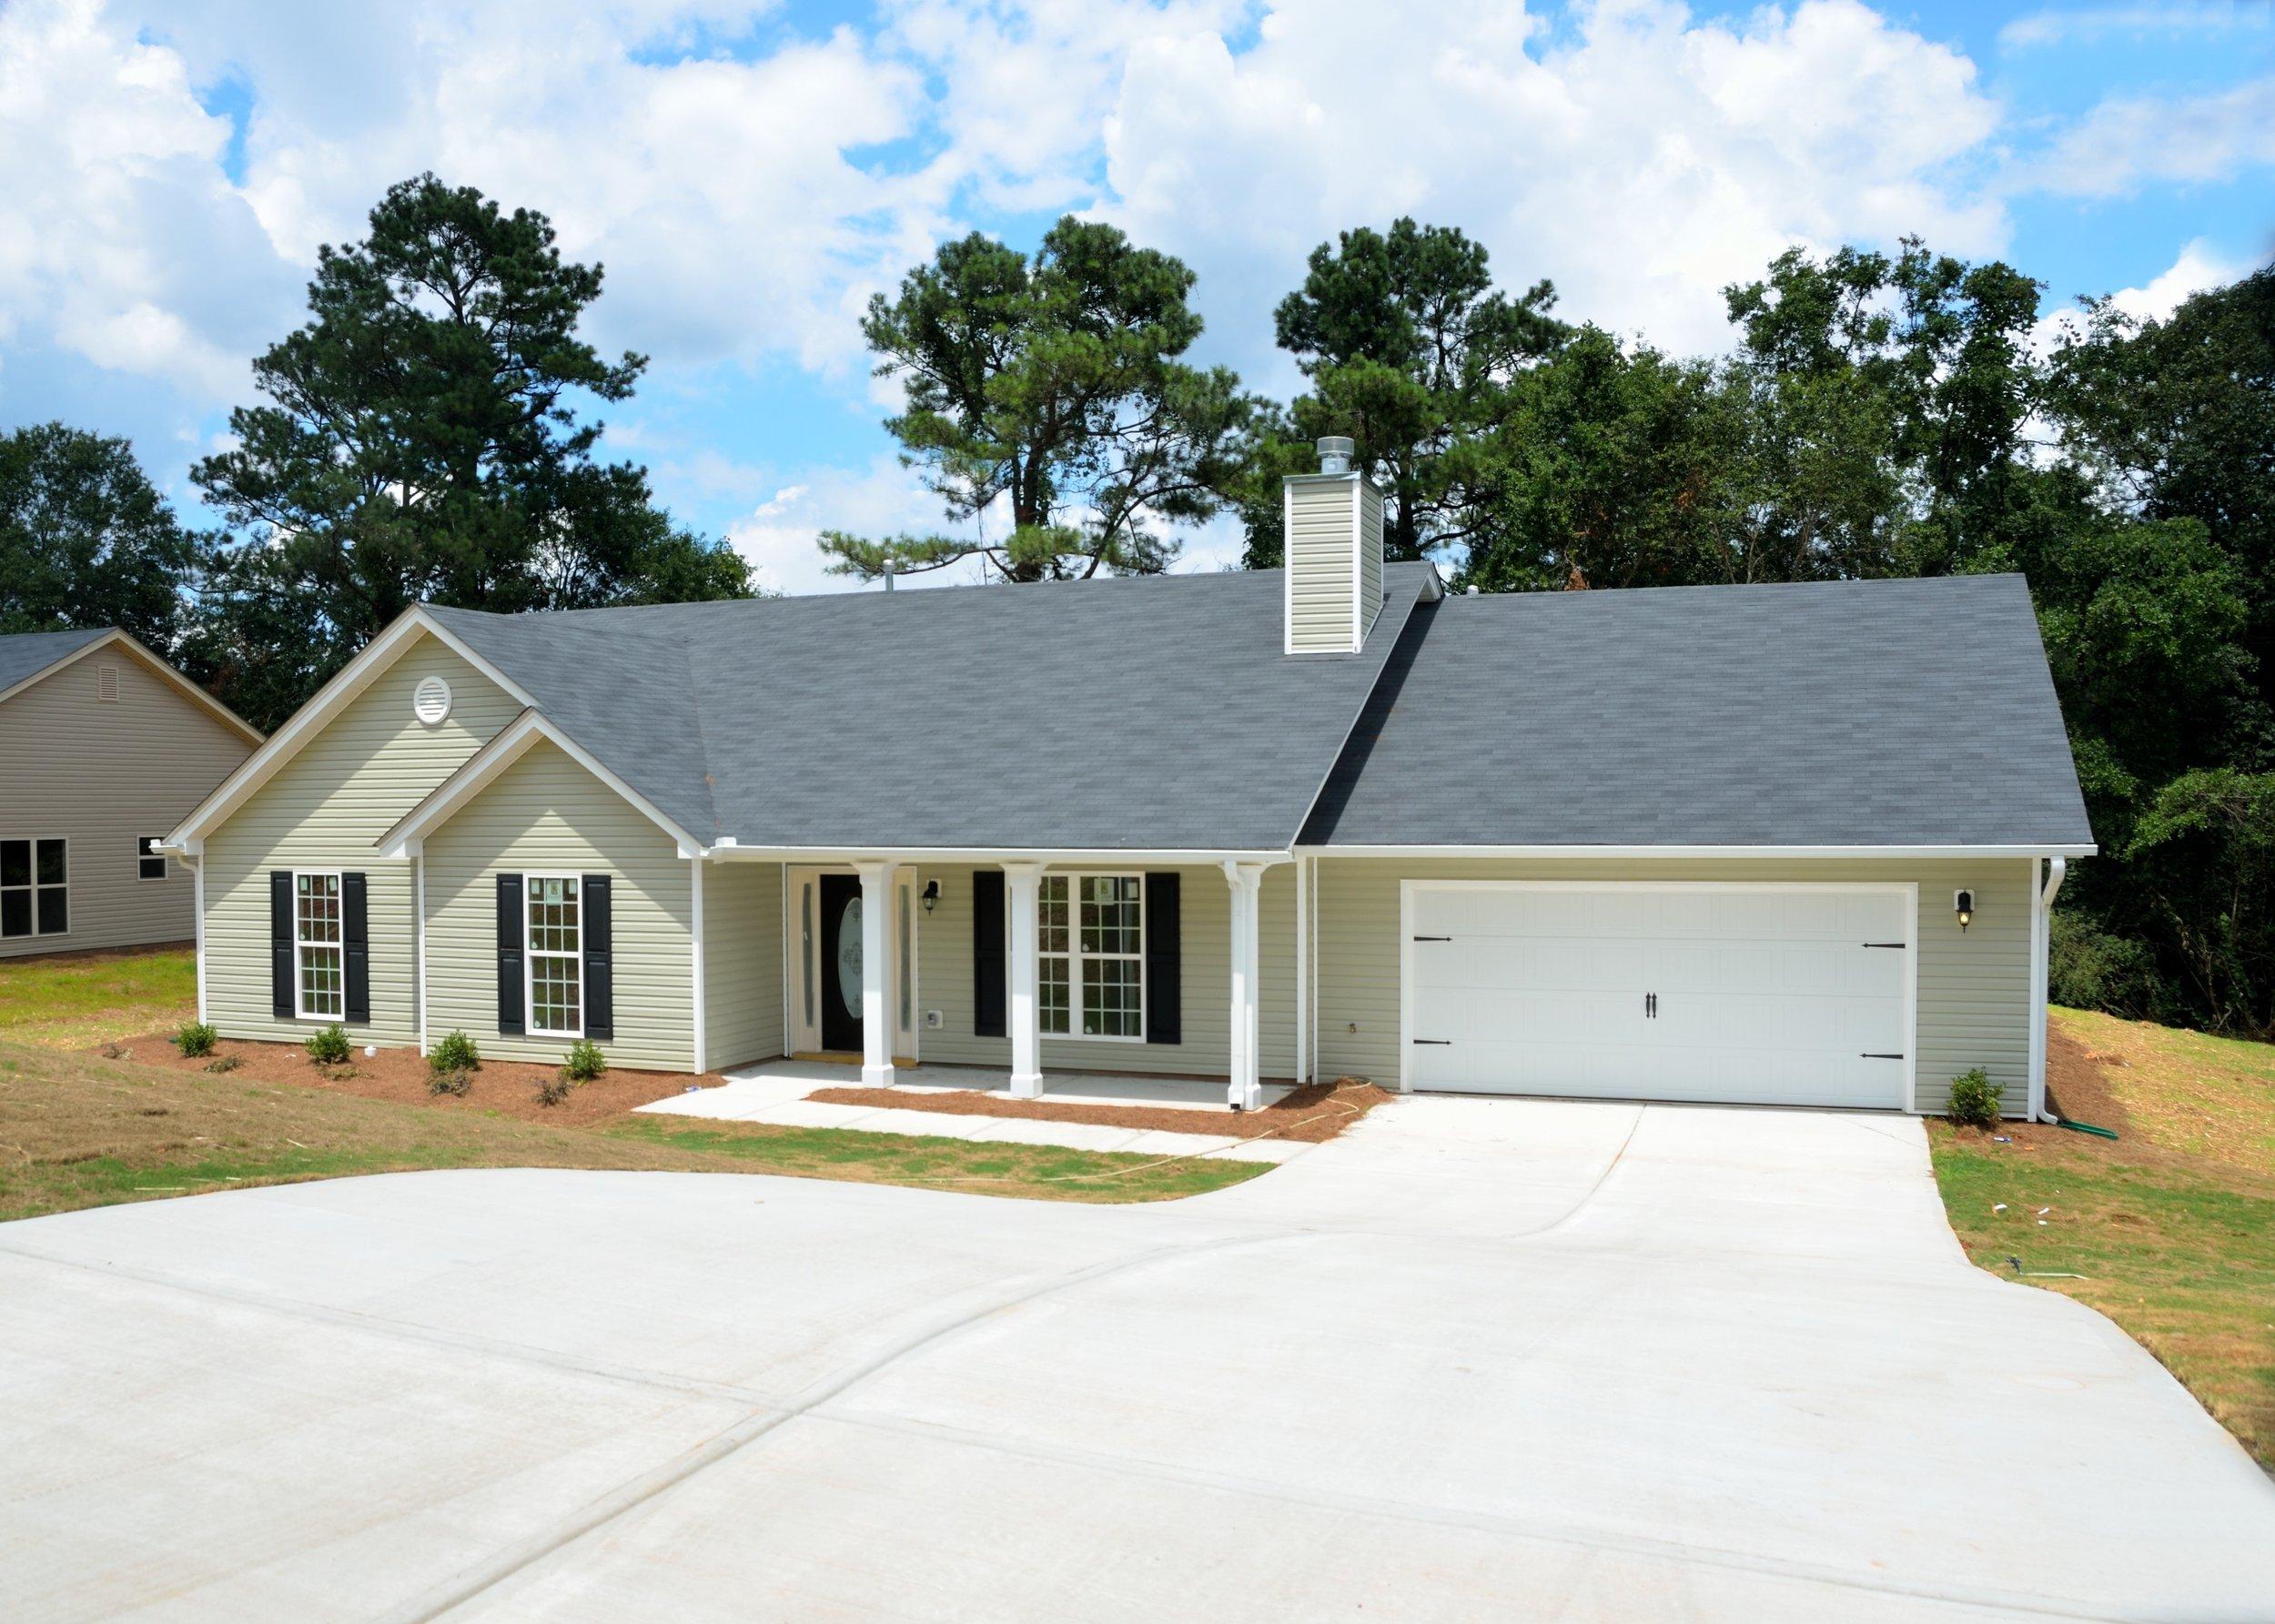 architecture-bungalow-buy-461024.jpg